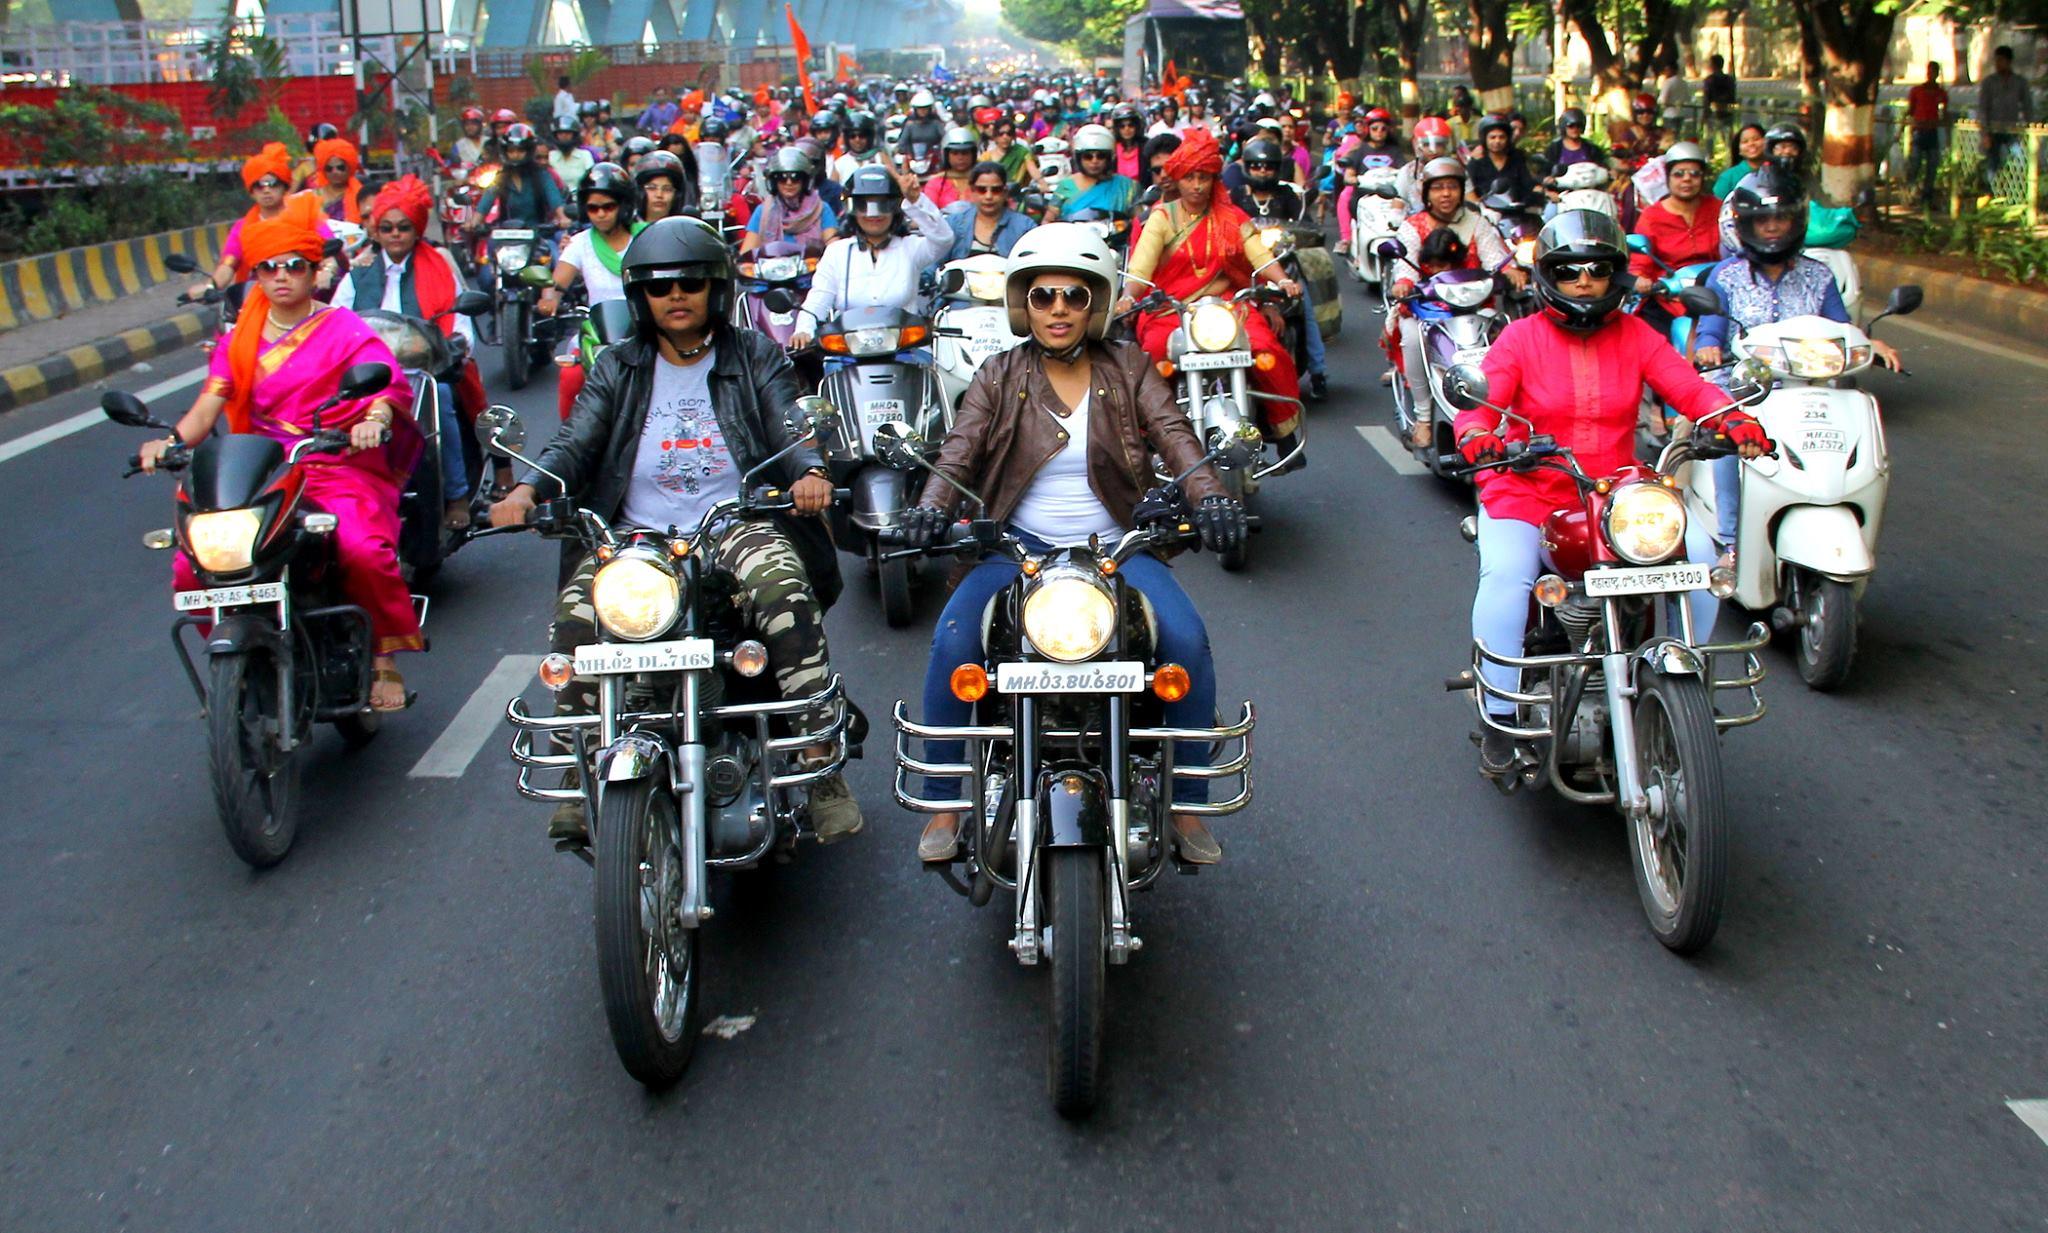 Bike rally photo